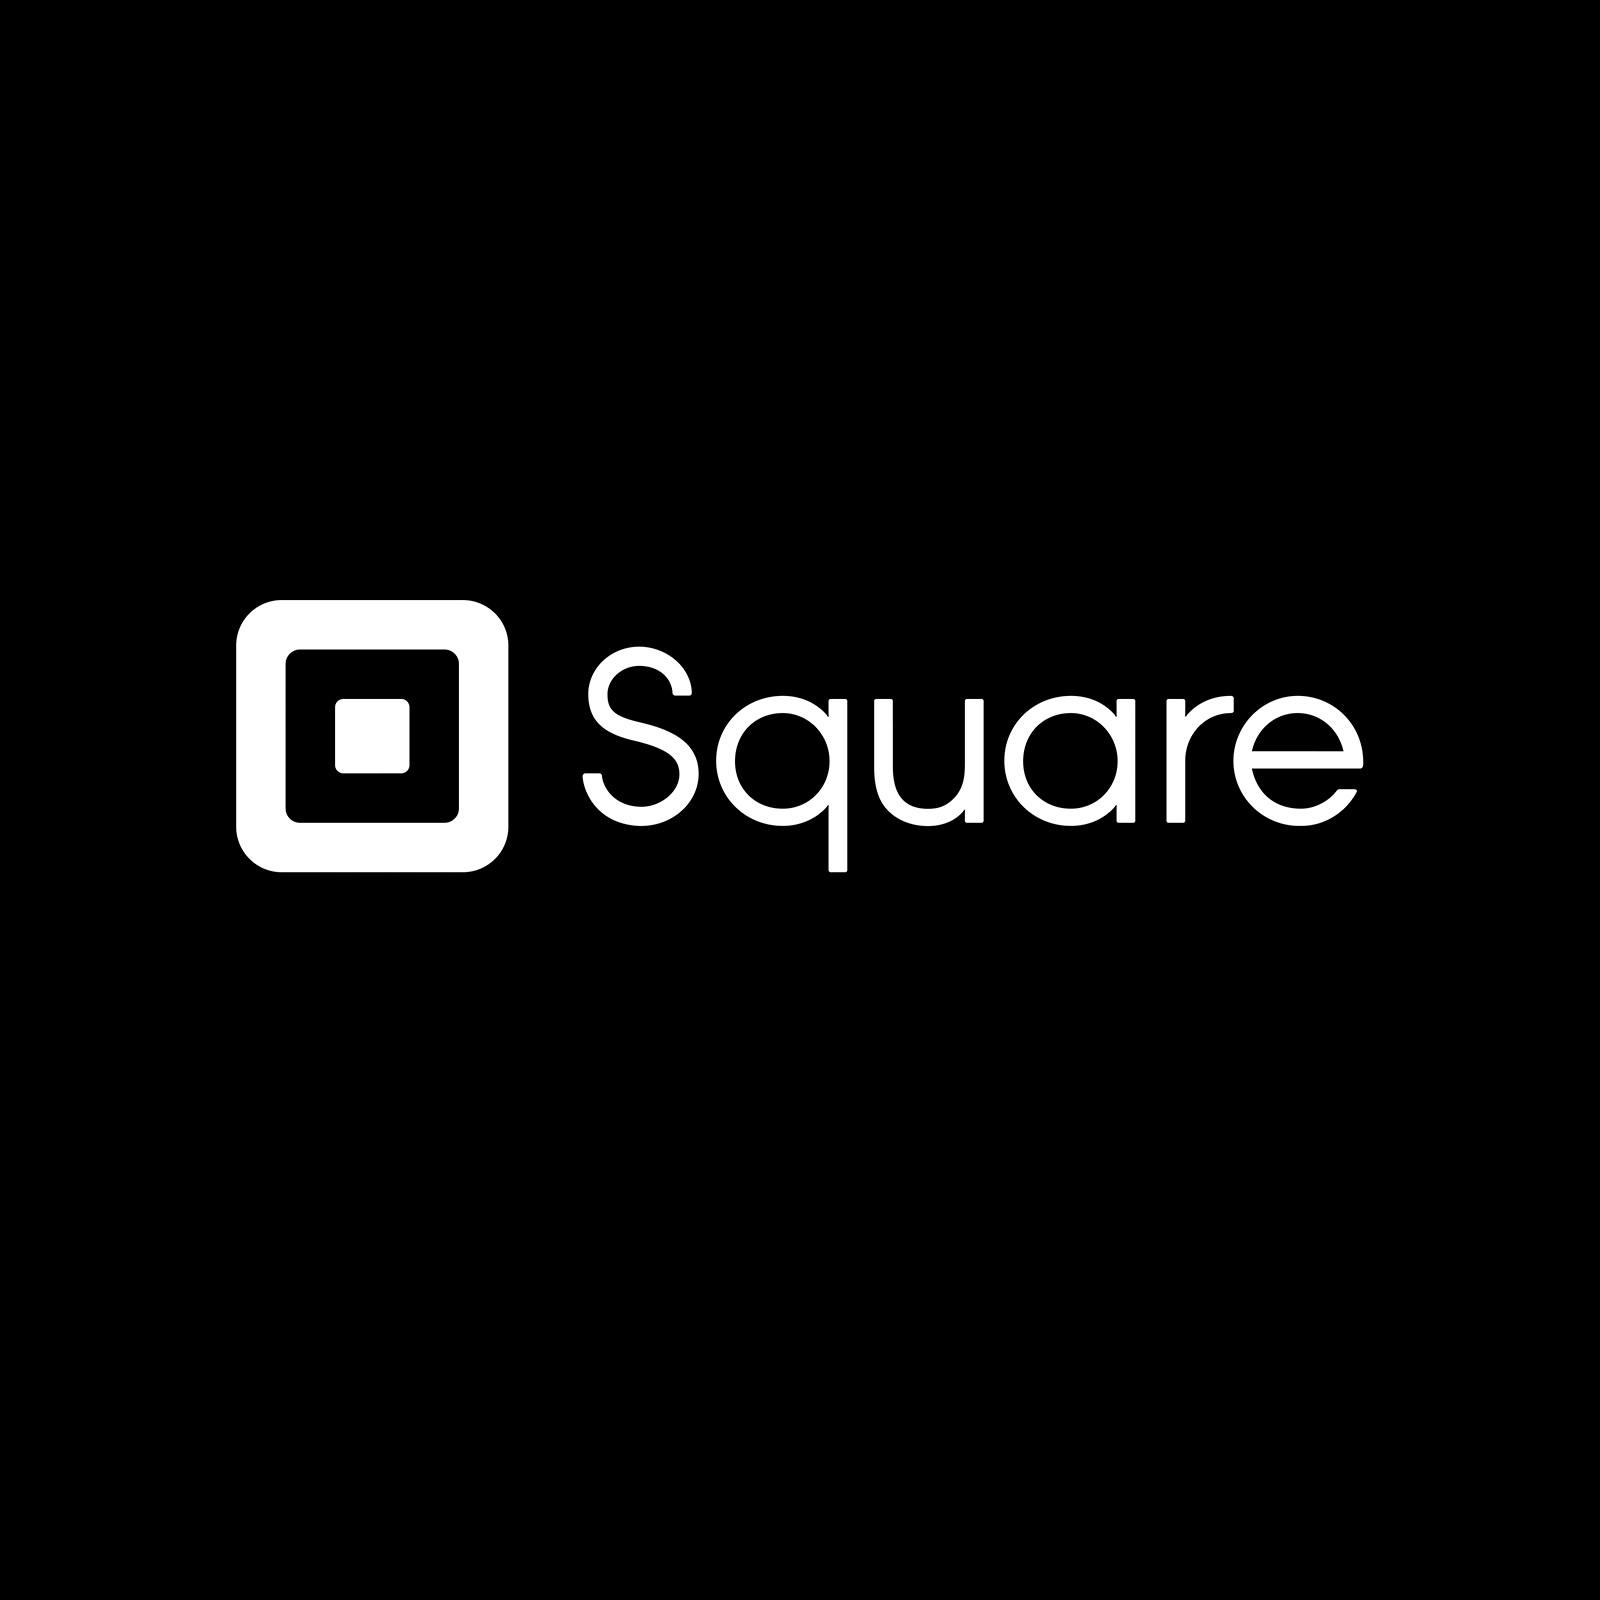 Square-logo-white.jpeg